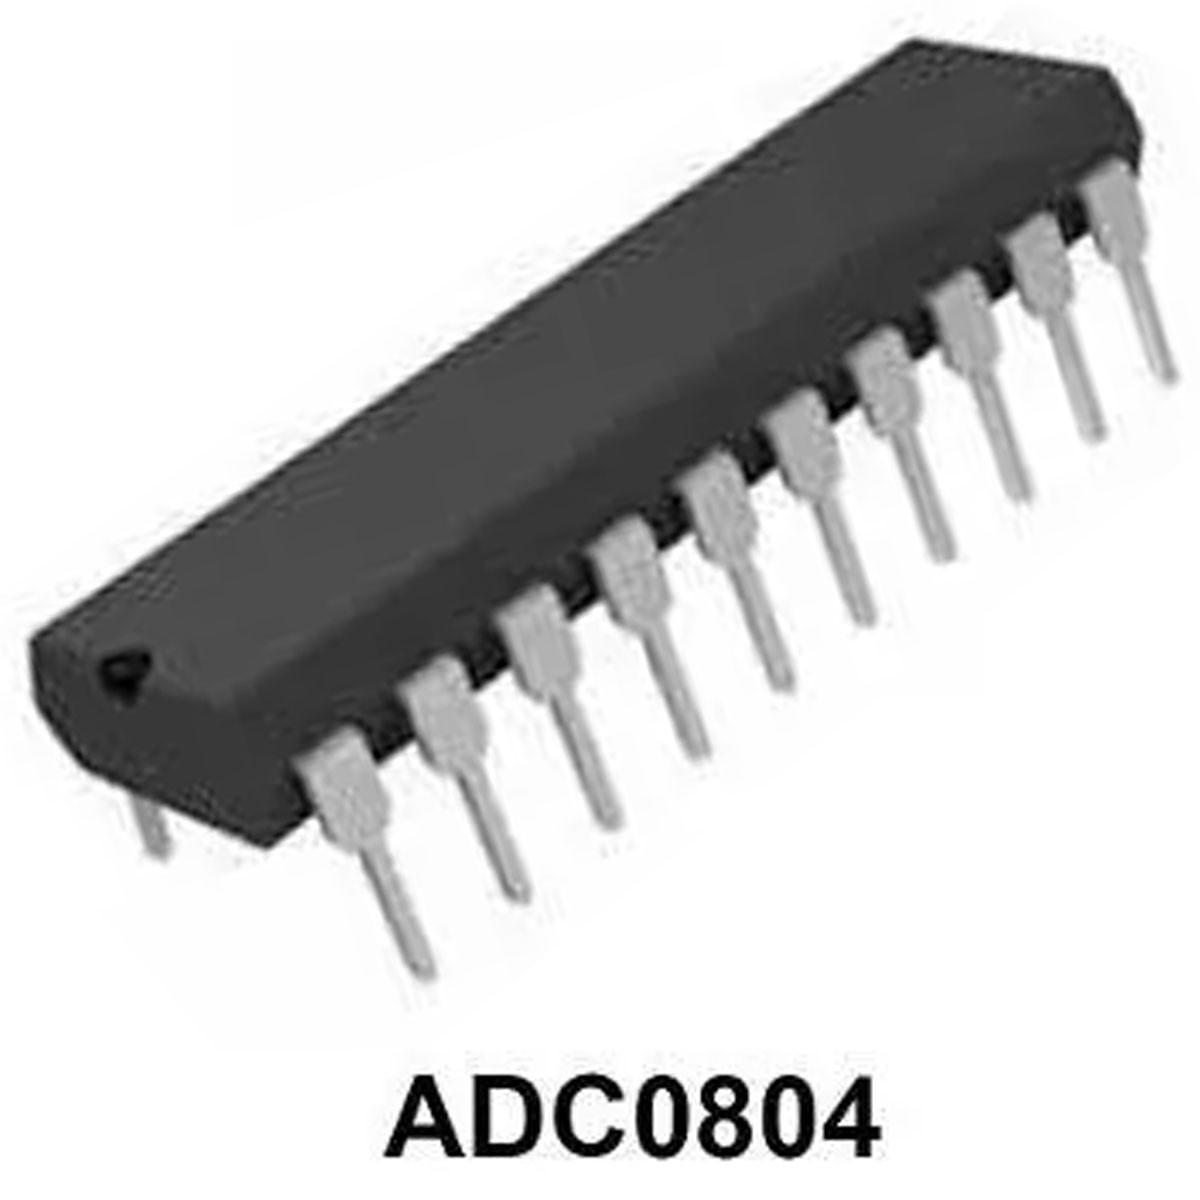 Circuito Integrado ADC0804 | Ci ADC 0804